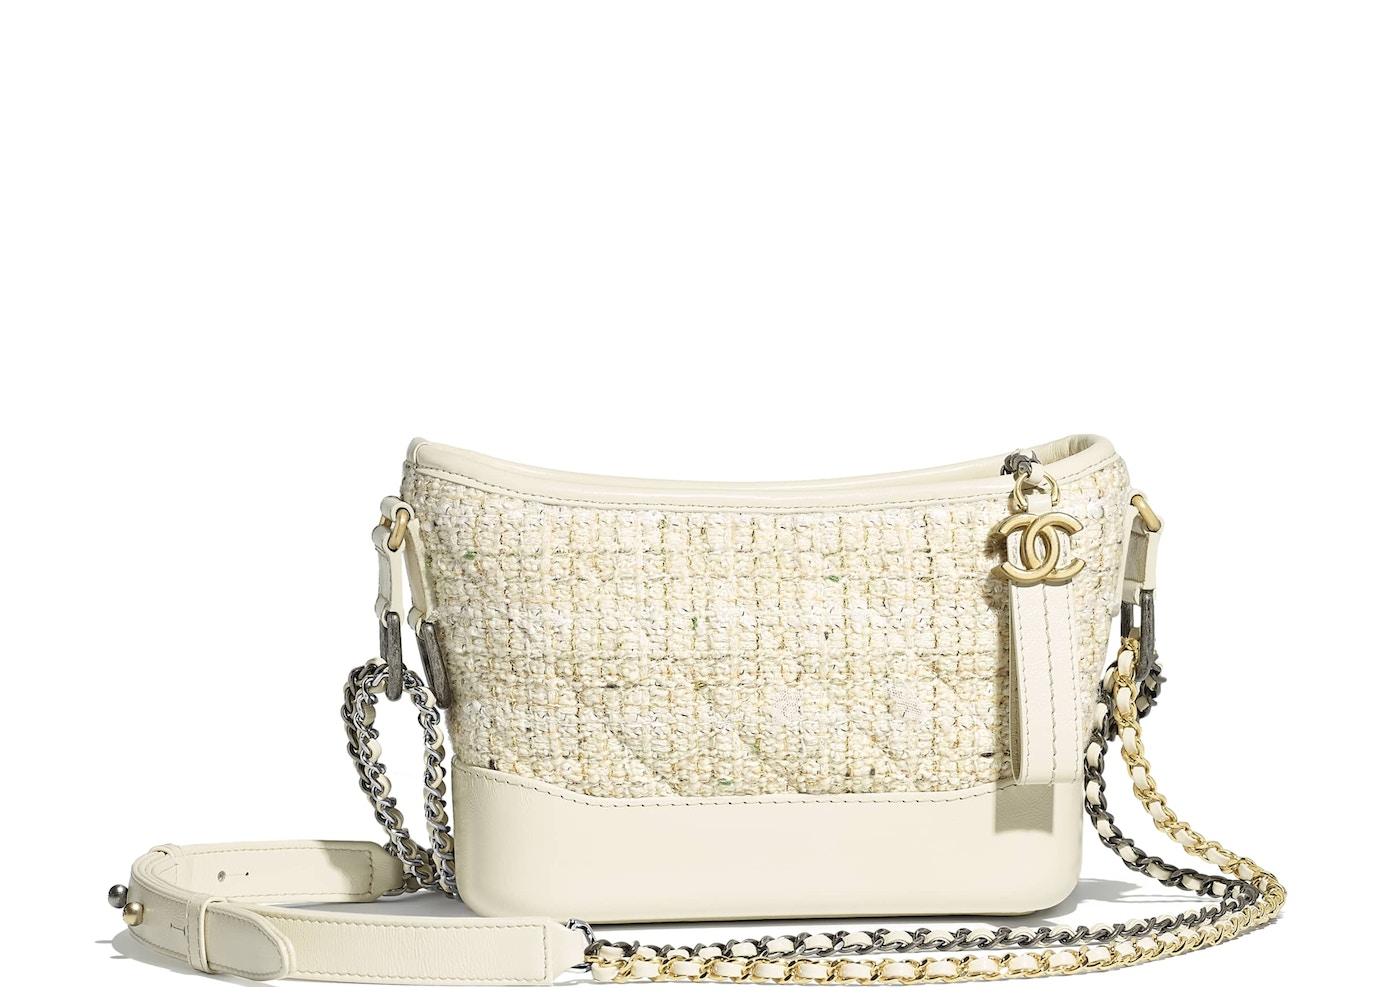 463835327da6 Chanel Gabrielle Hobo Bag Tweed Small Ecru White